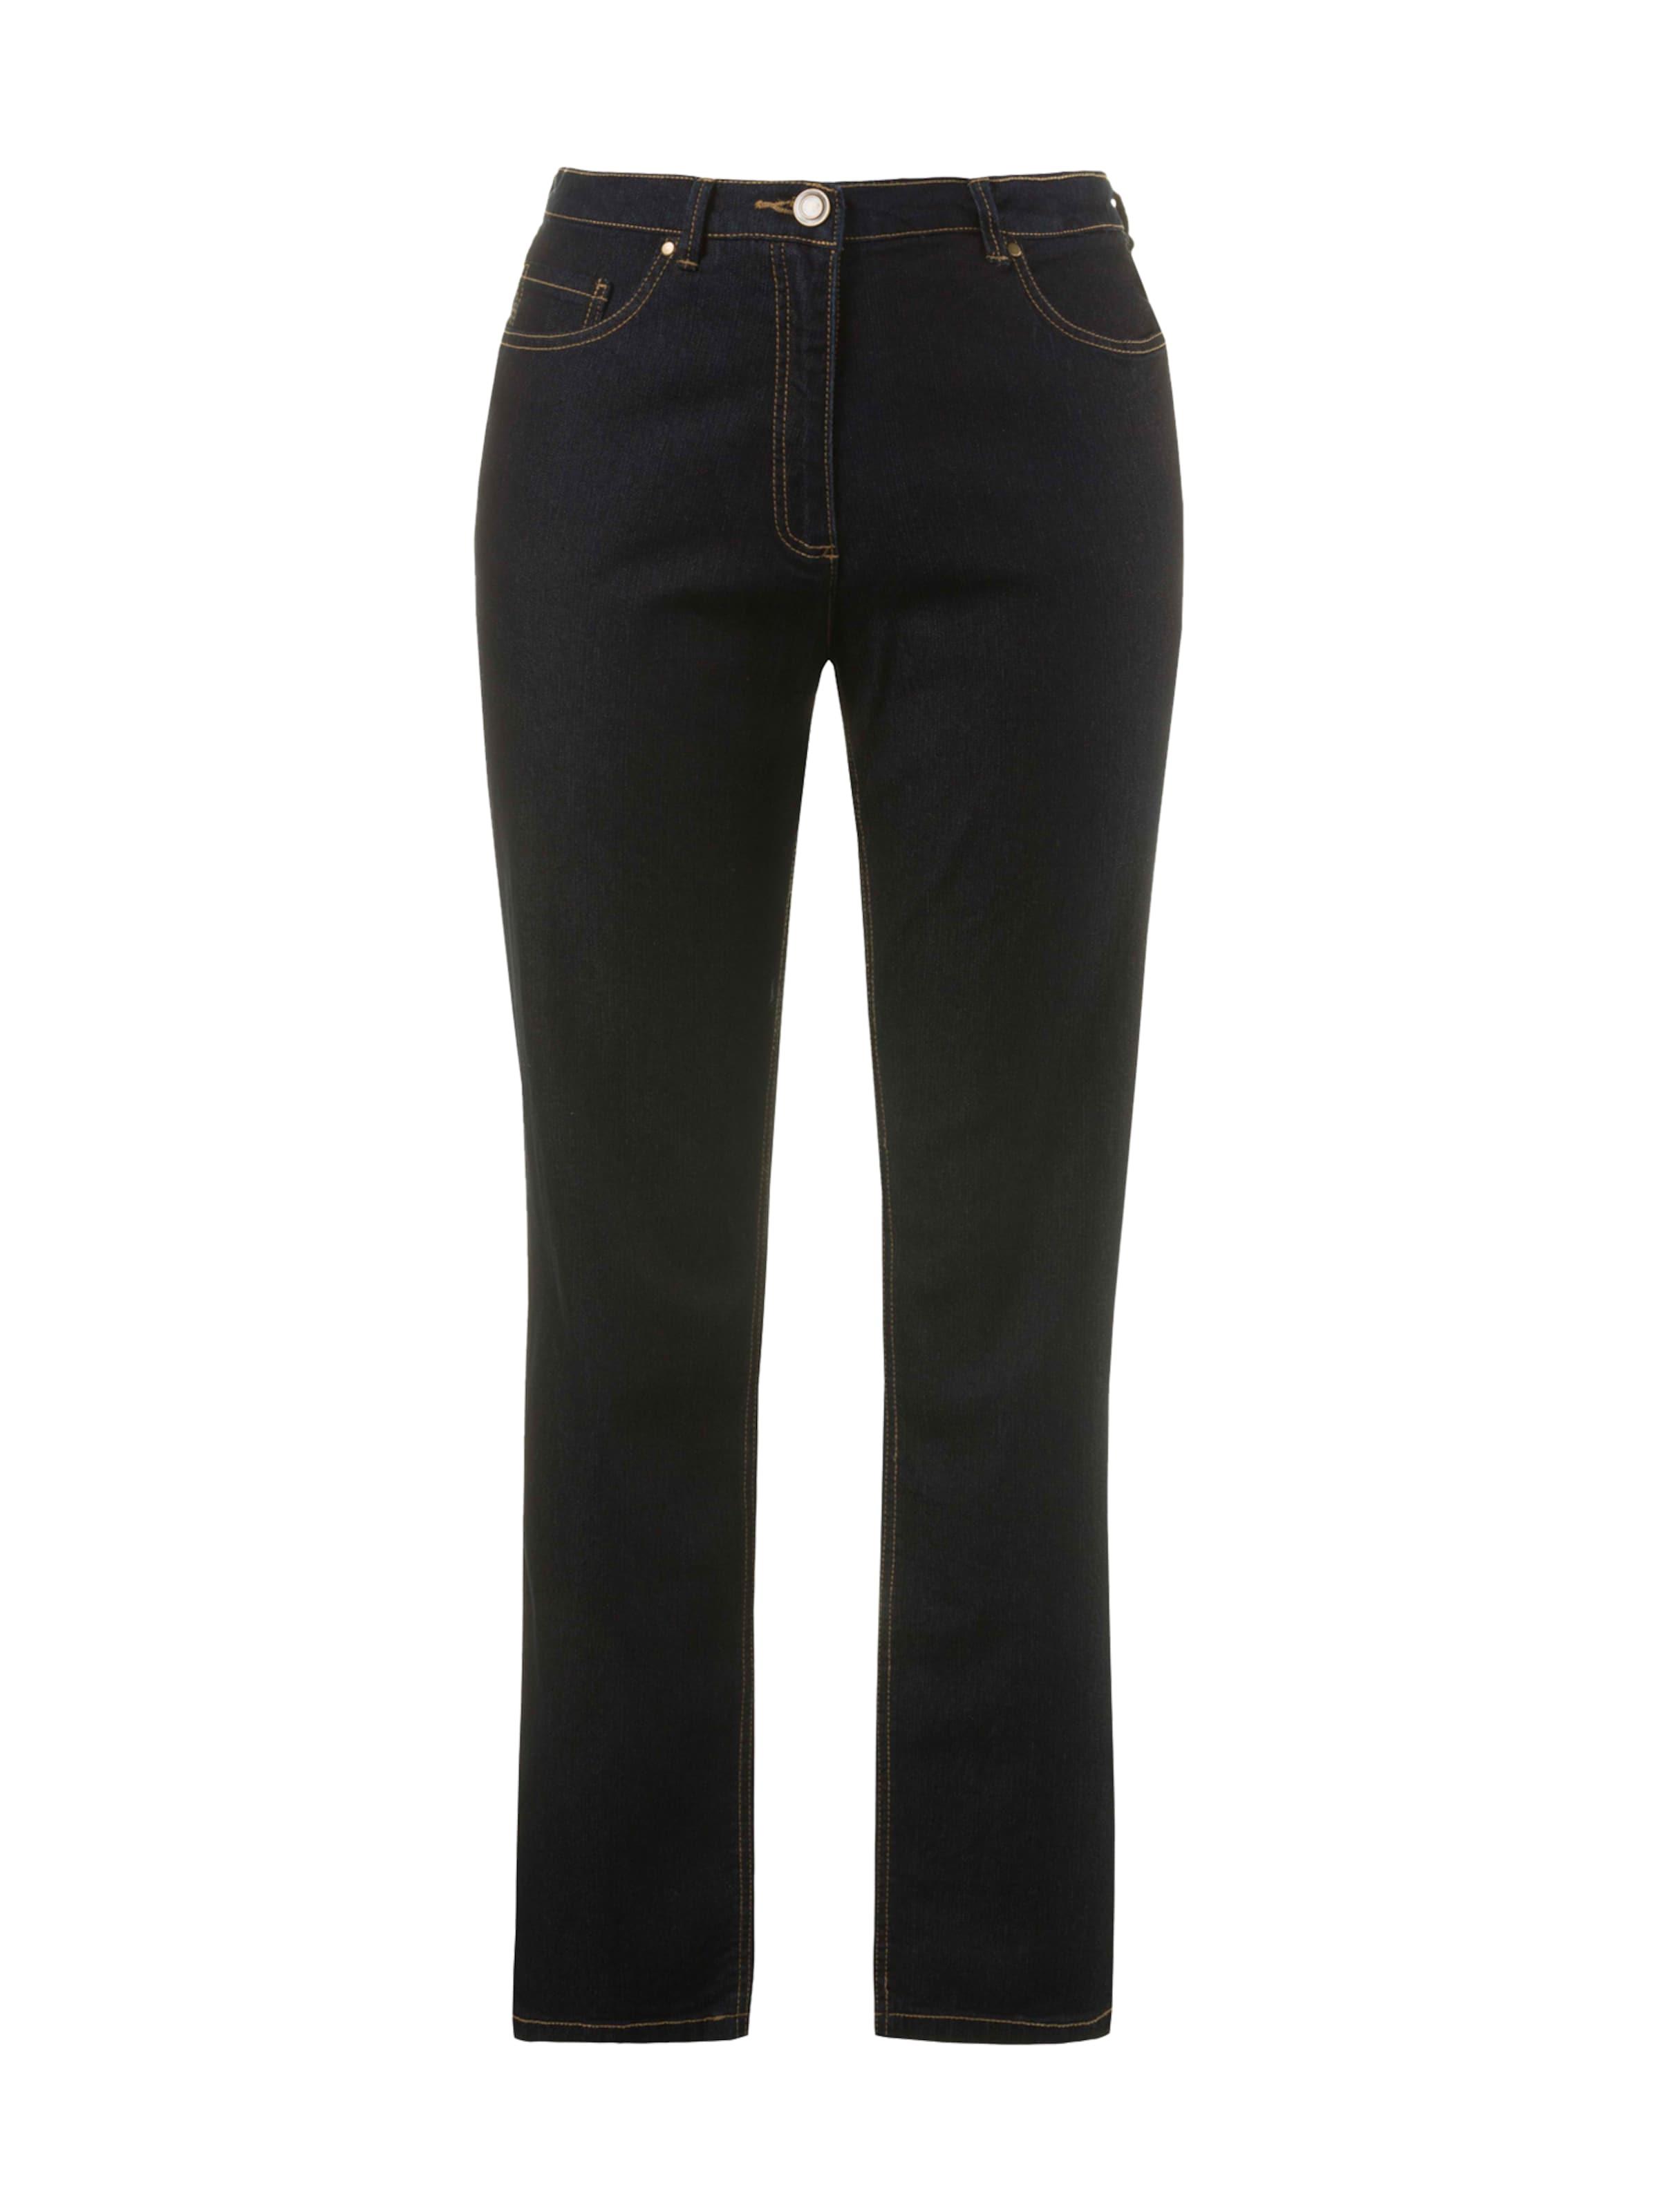 Jeans 'mandy' Ulla Popken Nachtblau In 9HbeDIYWE2